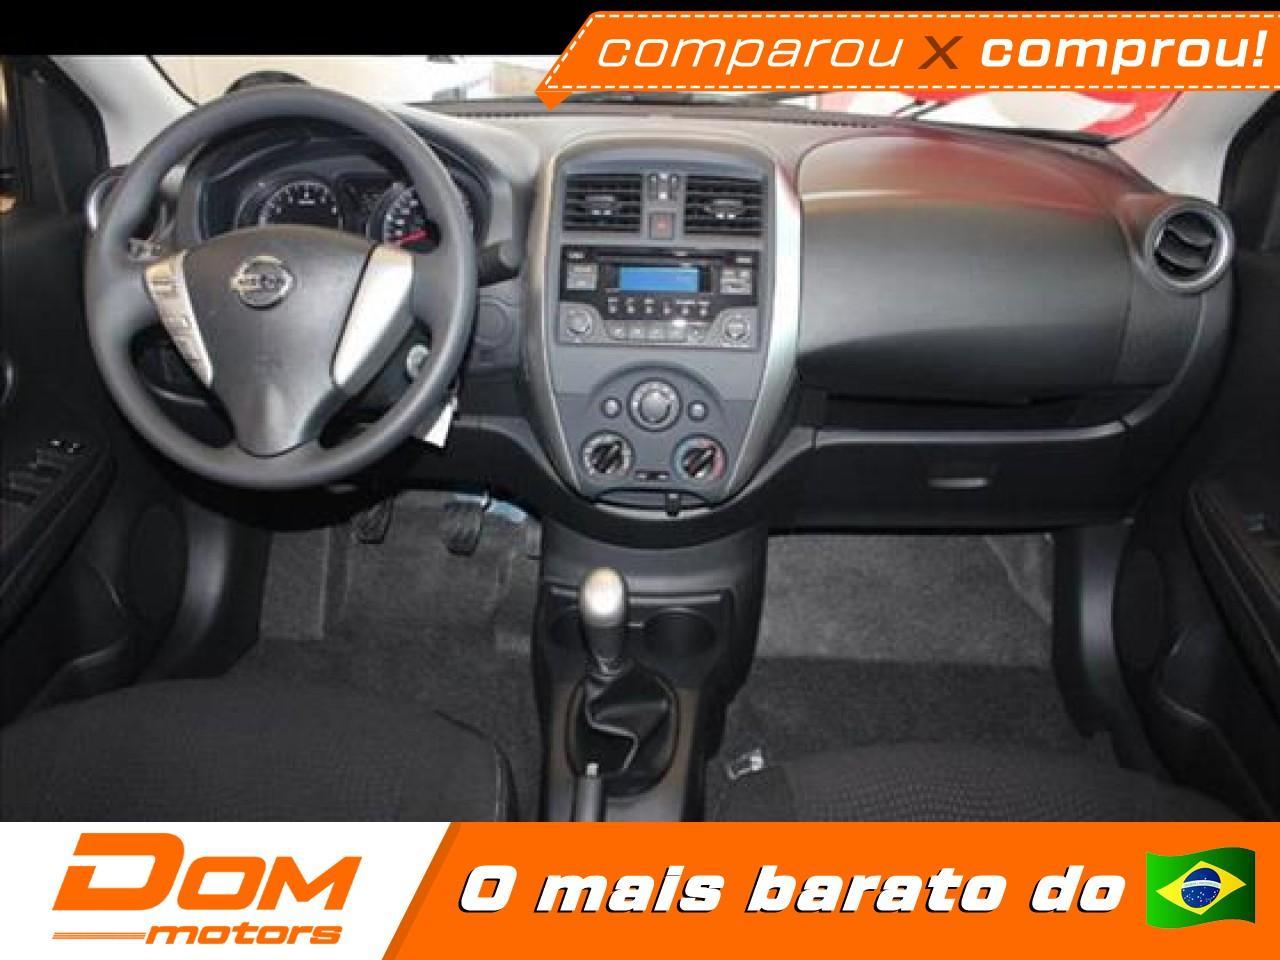 NISSAN Versa Sedan 1.6 16V 4P FLEX SENSE XTRONIC AUTOMÁTICO CVT, Foto 3